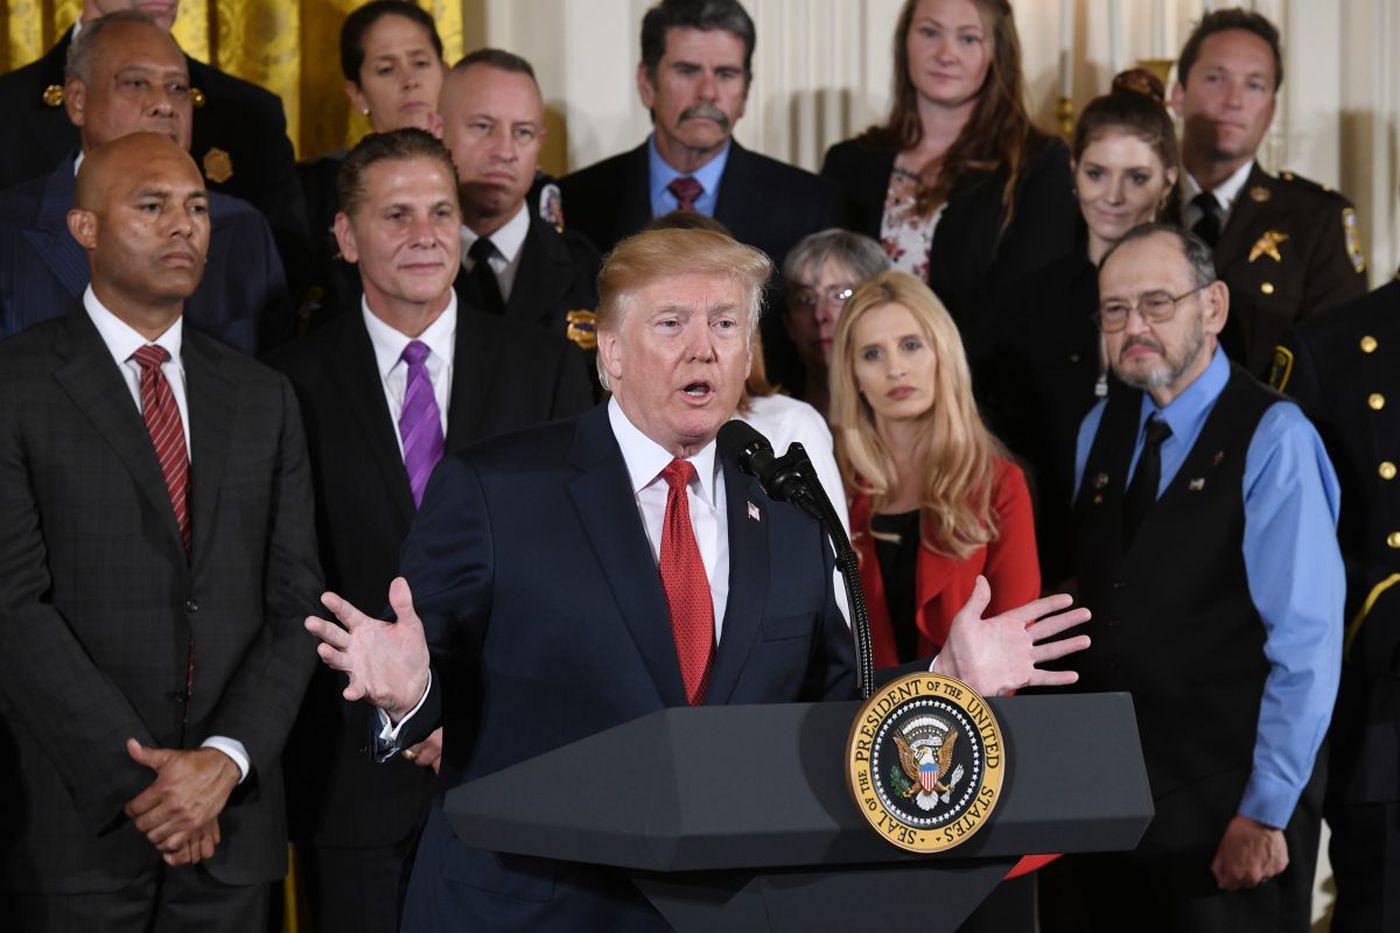 In Philly region, Trump's opioid statement prompts hope, skepticism